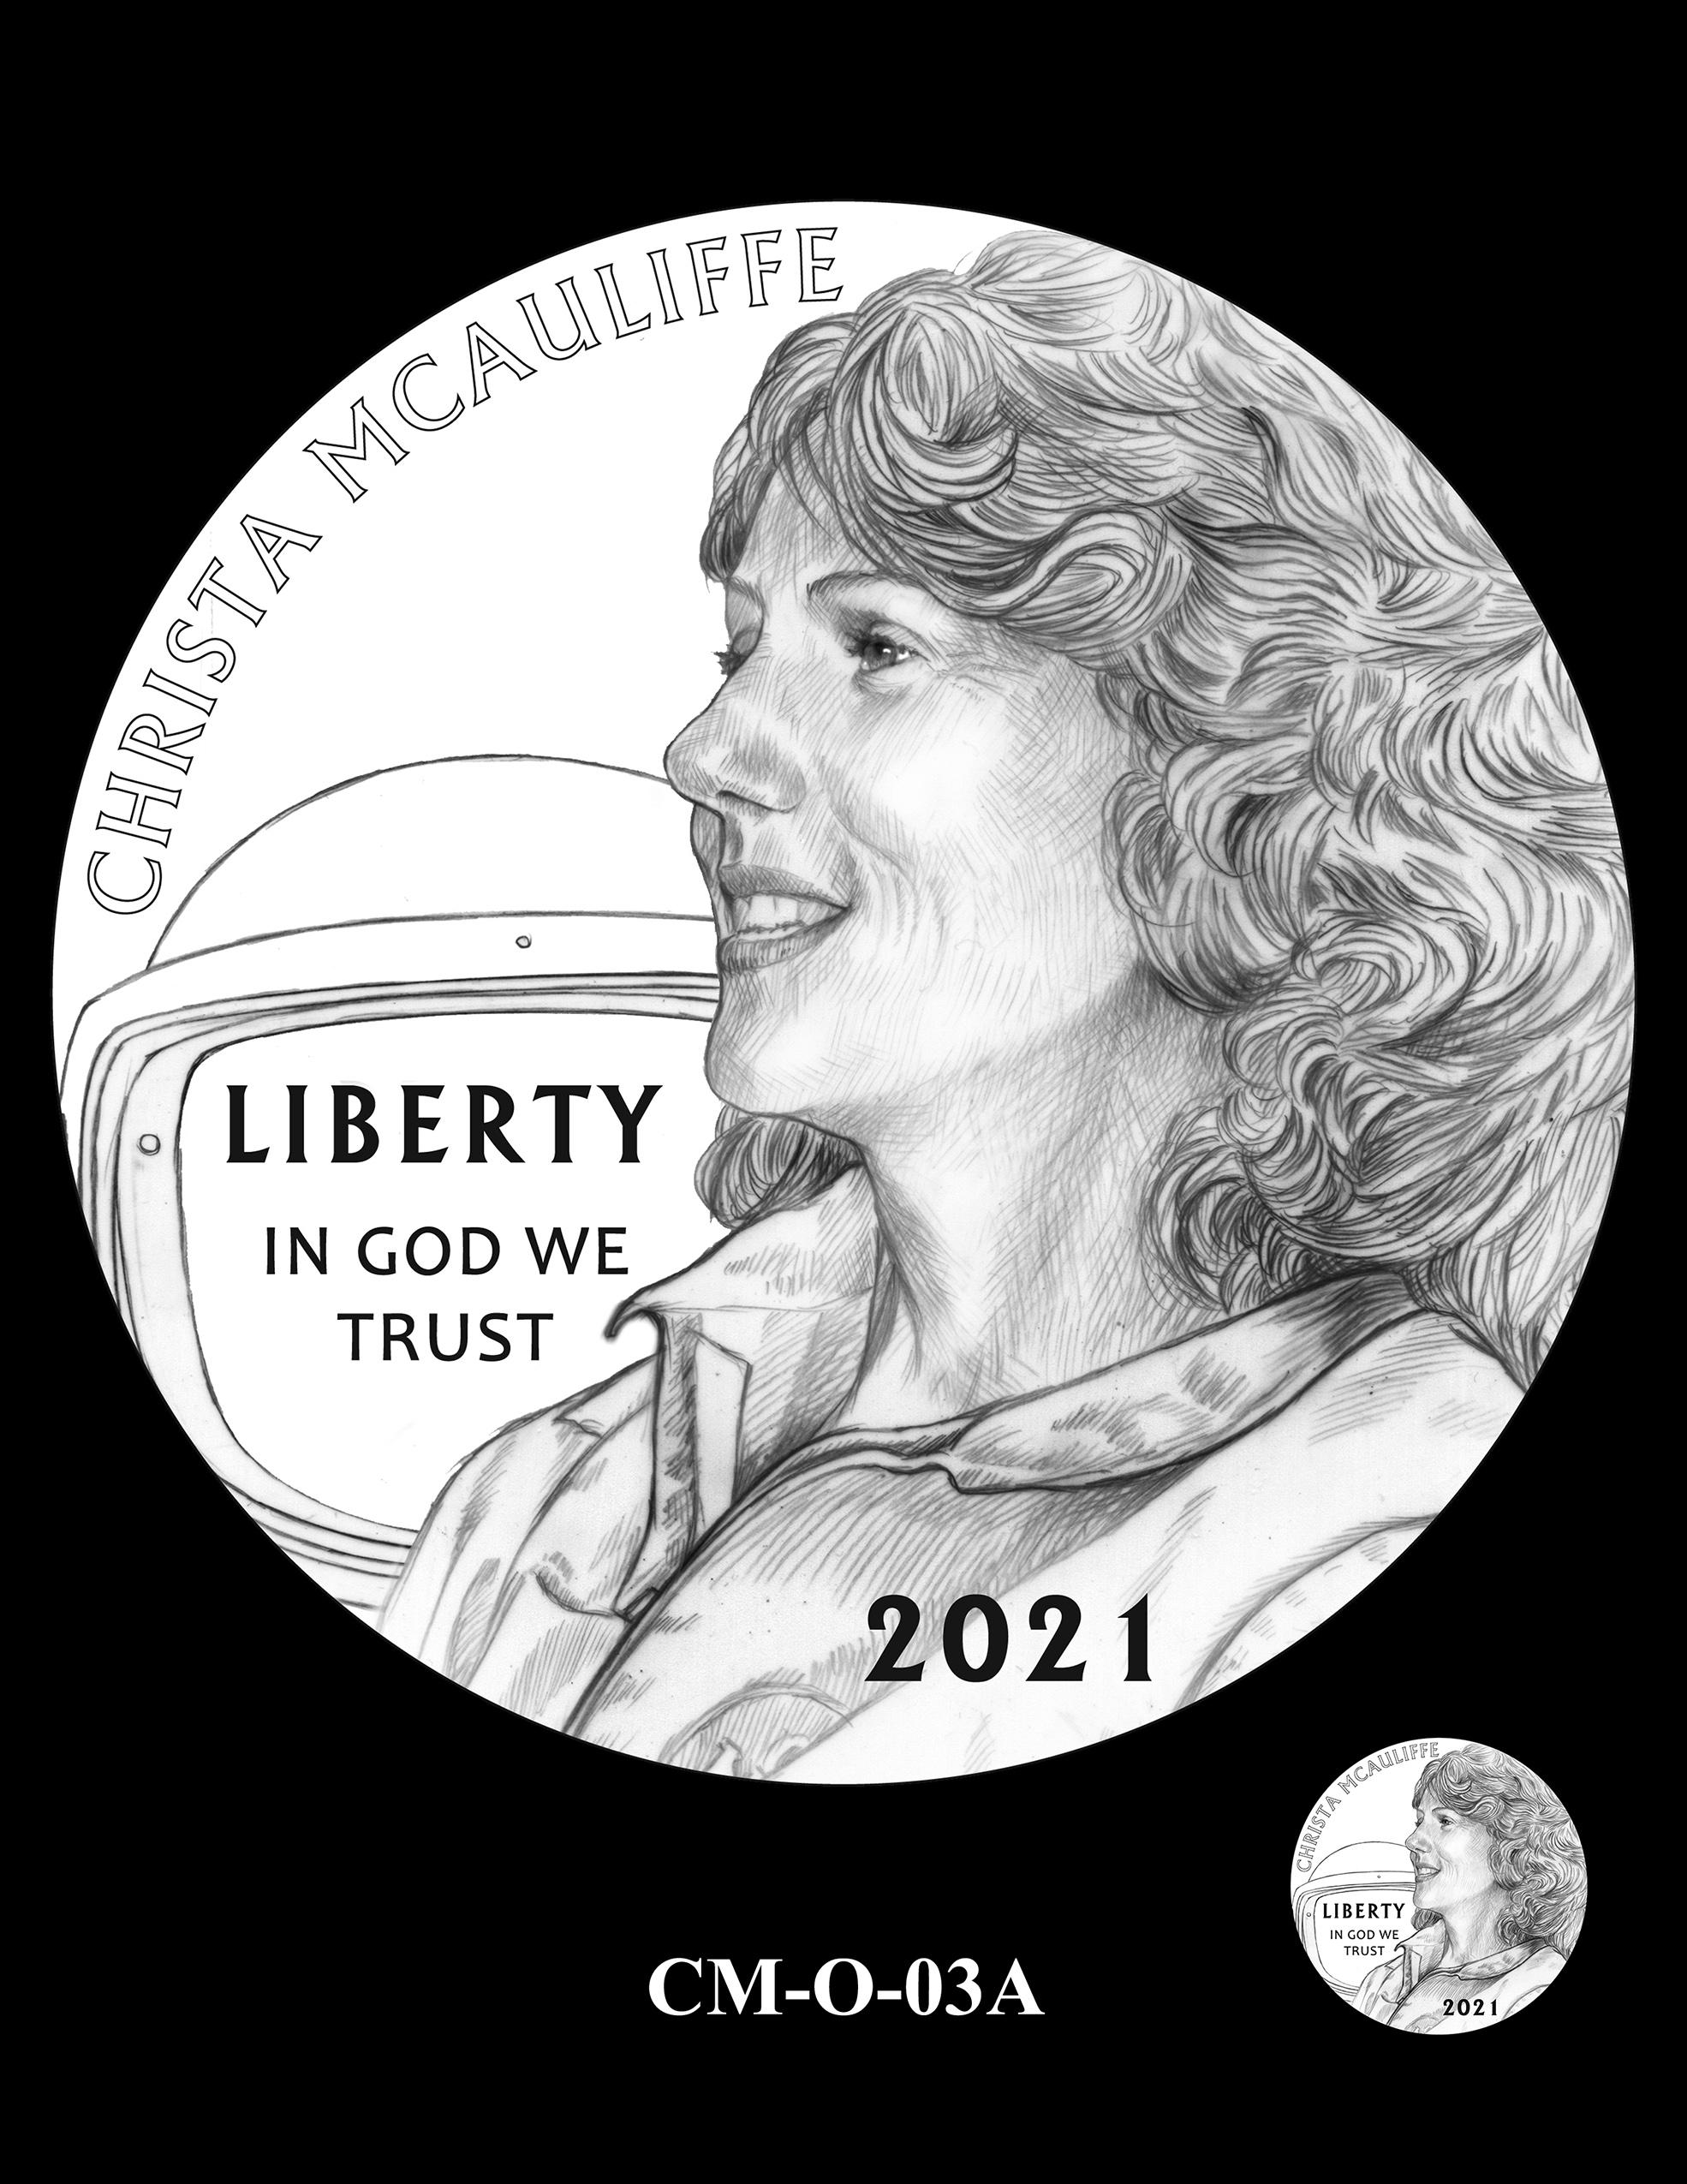 CM-O-03A -- 2021 Christa McAuliffe Commemorative Coin